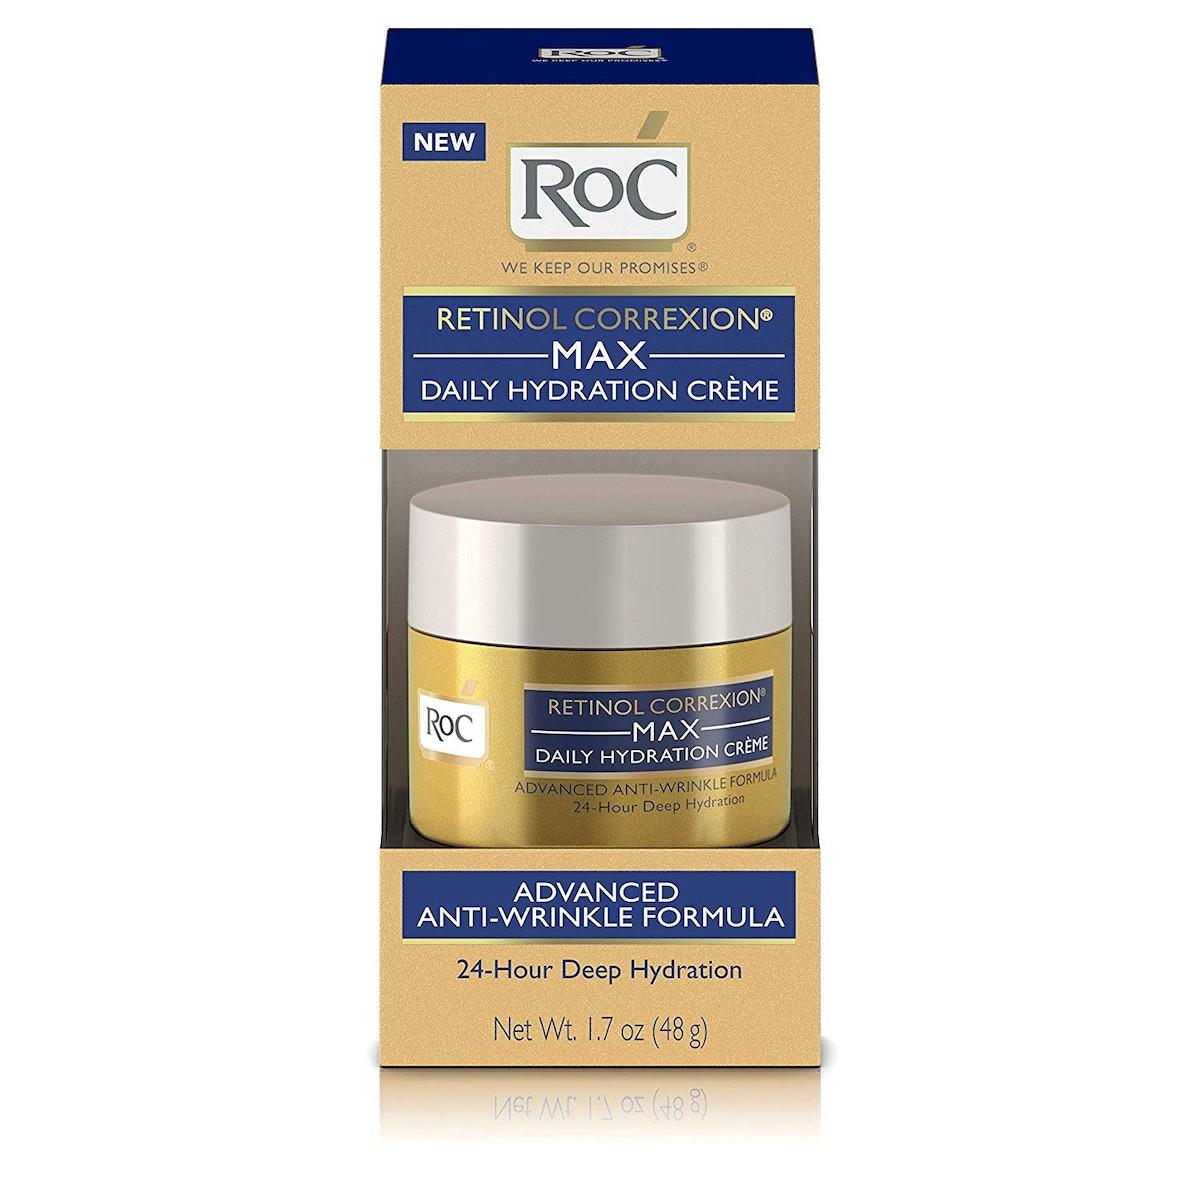 Retinol Correxion Max Daily Hydration Retinol cream